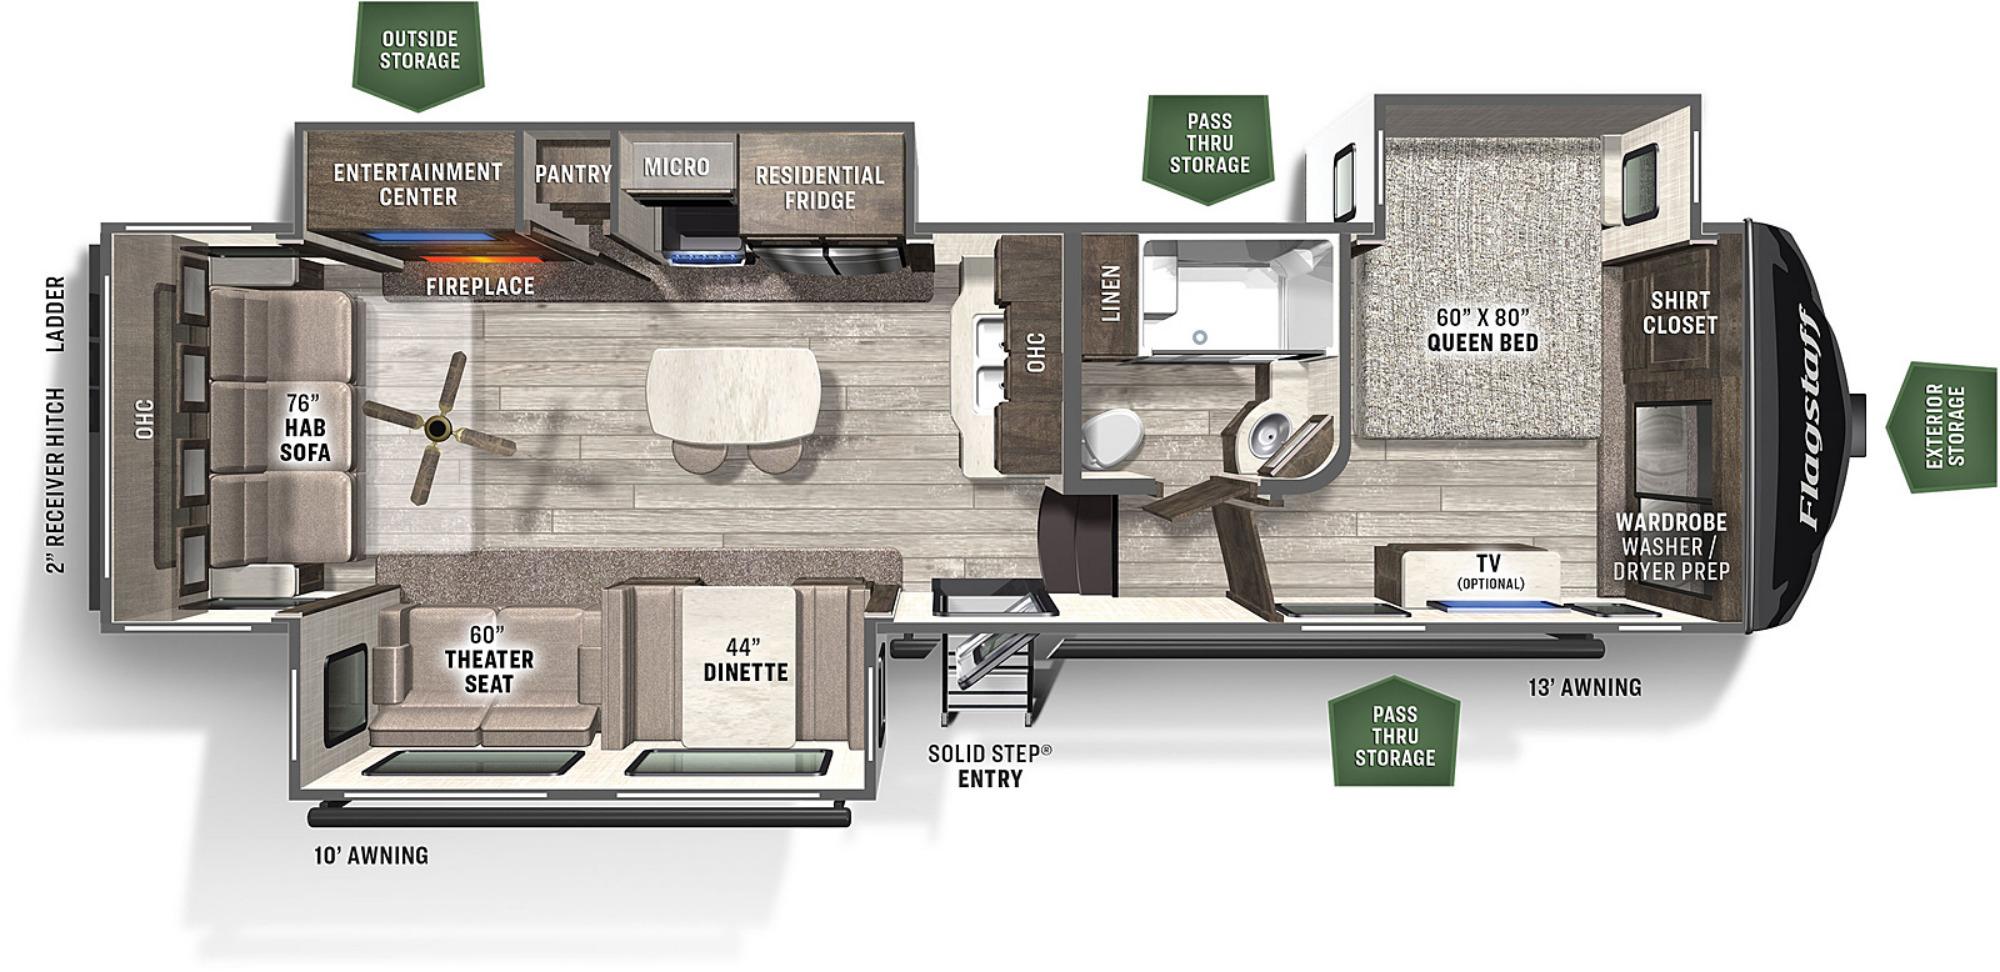 View Floor Plan for 2022 FOREST RIVER FLAGSTAFF SUPER LITE 529IKRL